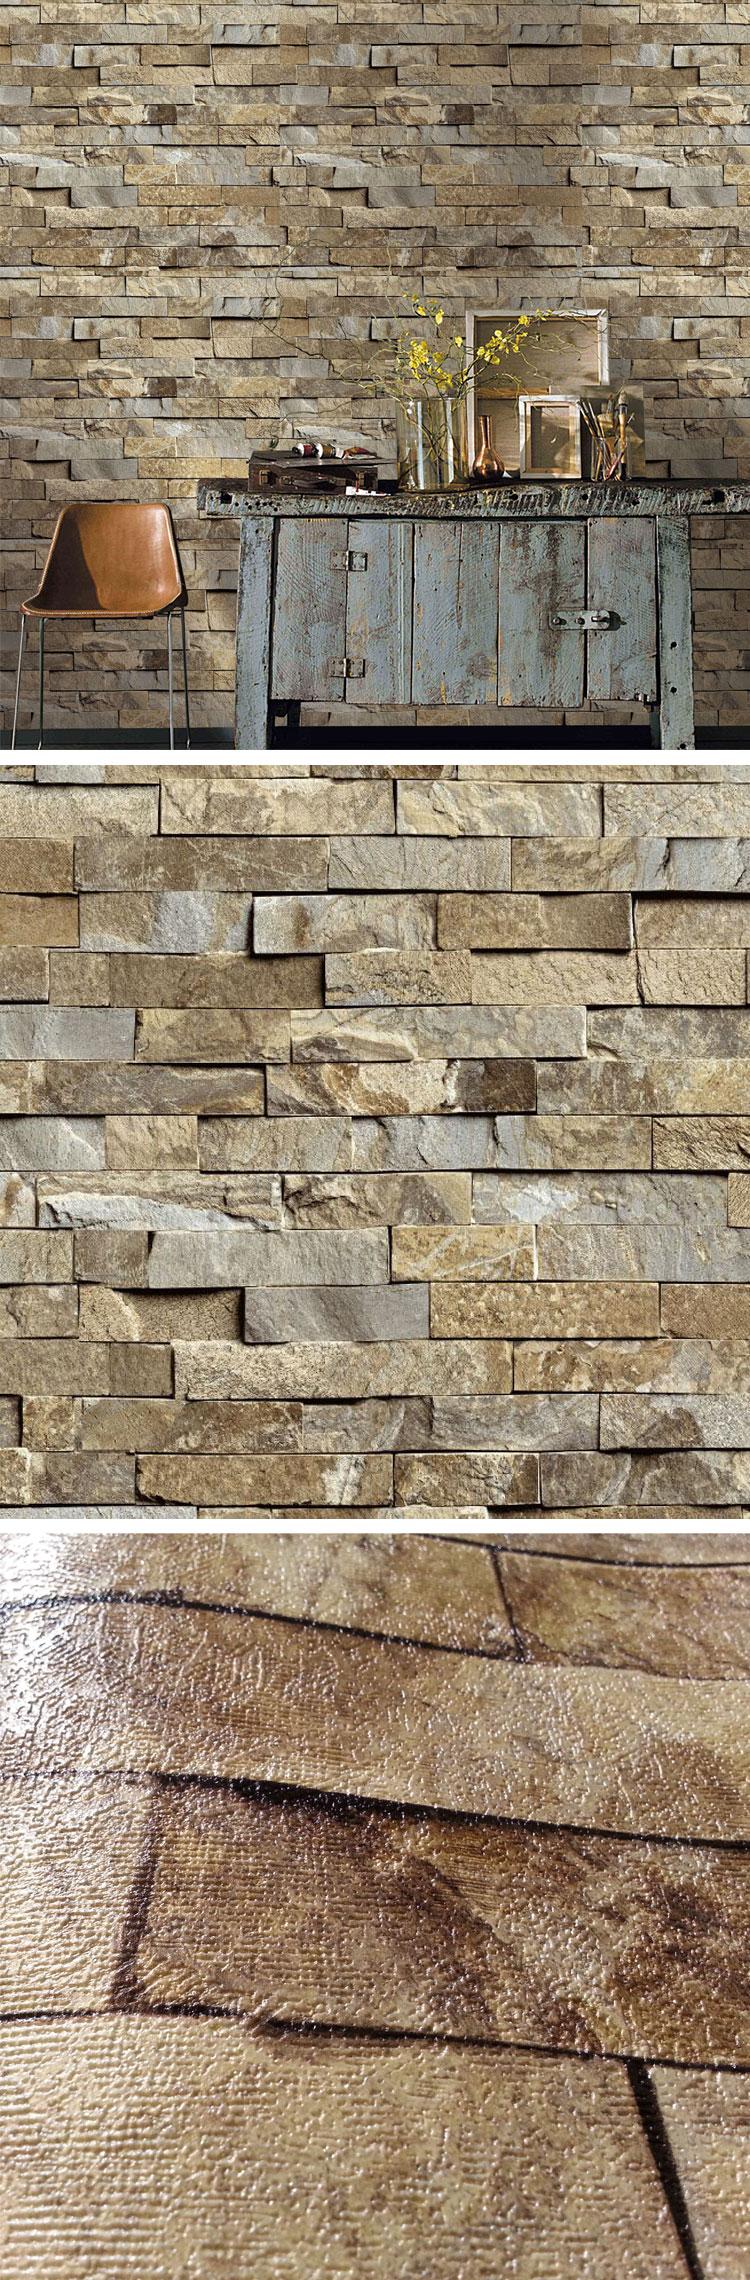 Ys10603 high quality cheap price 3d brick wallpaper for for Cheap brick wallpaper